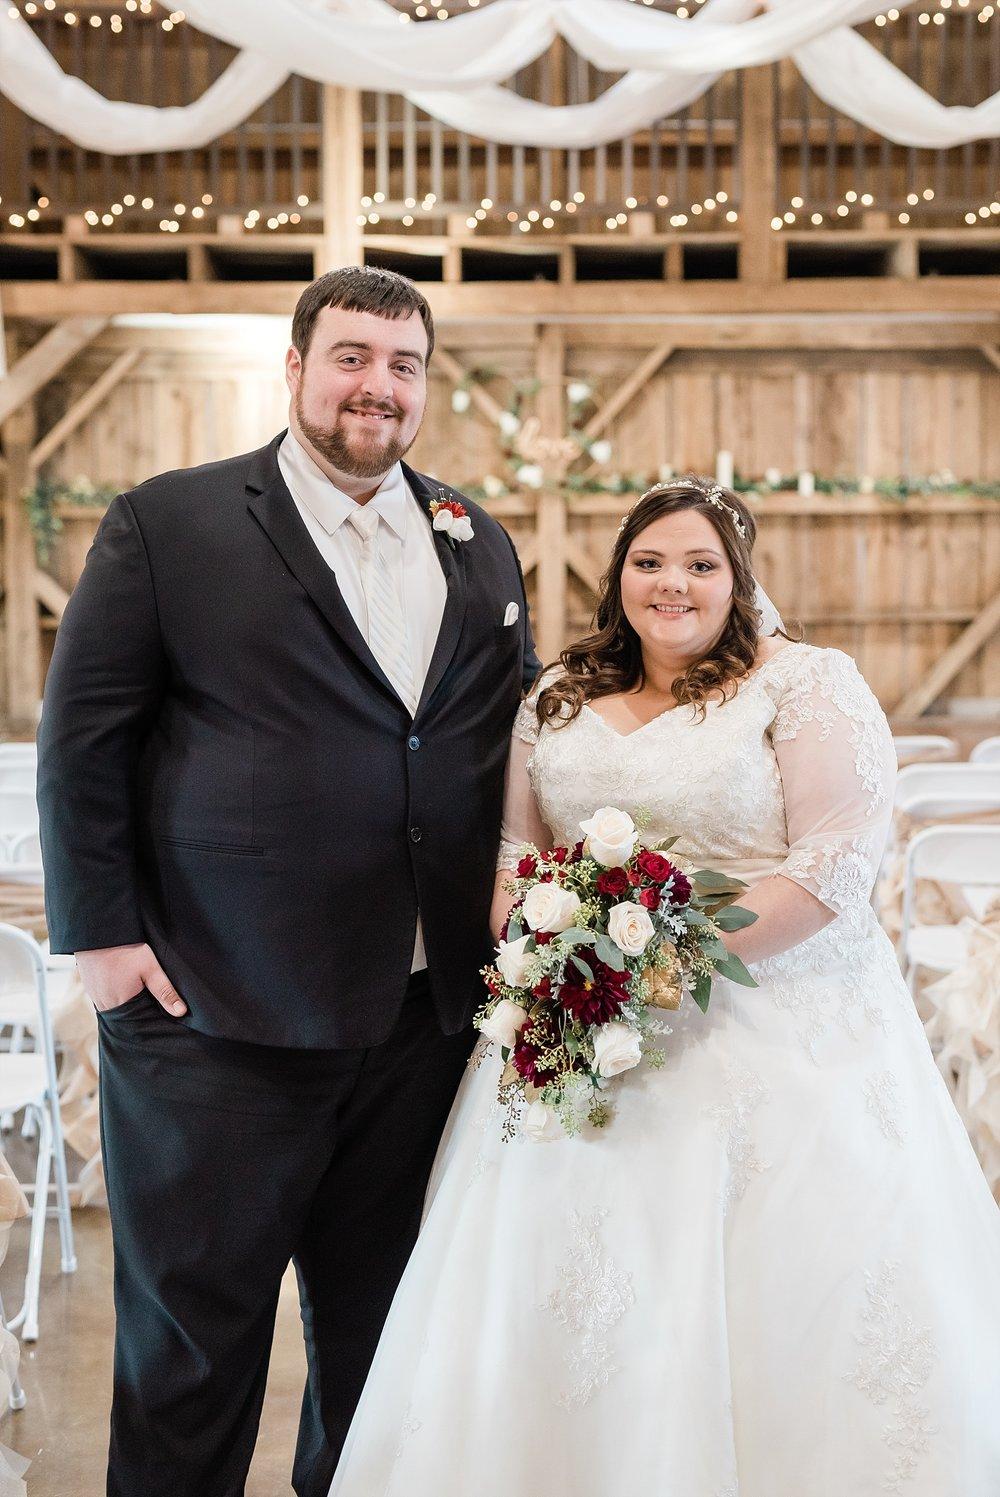 Golden Winter Wedding at The Legacy Barn in Barnett Missouri by Kelsi Kliethermes Photography Columbia Missouri Wedding Photographer_0024.jpg